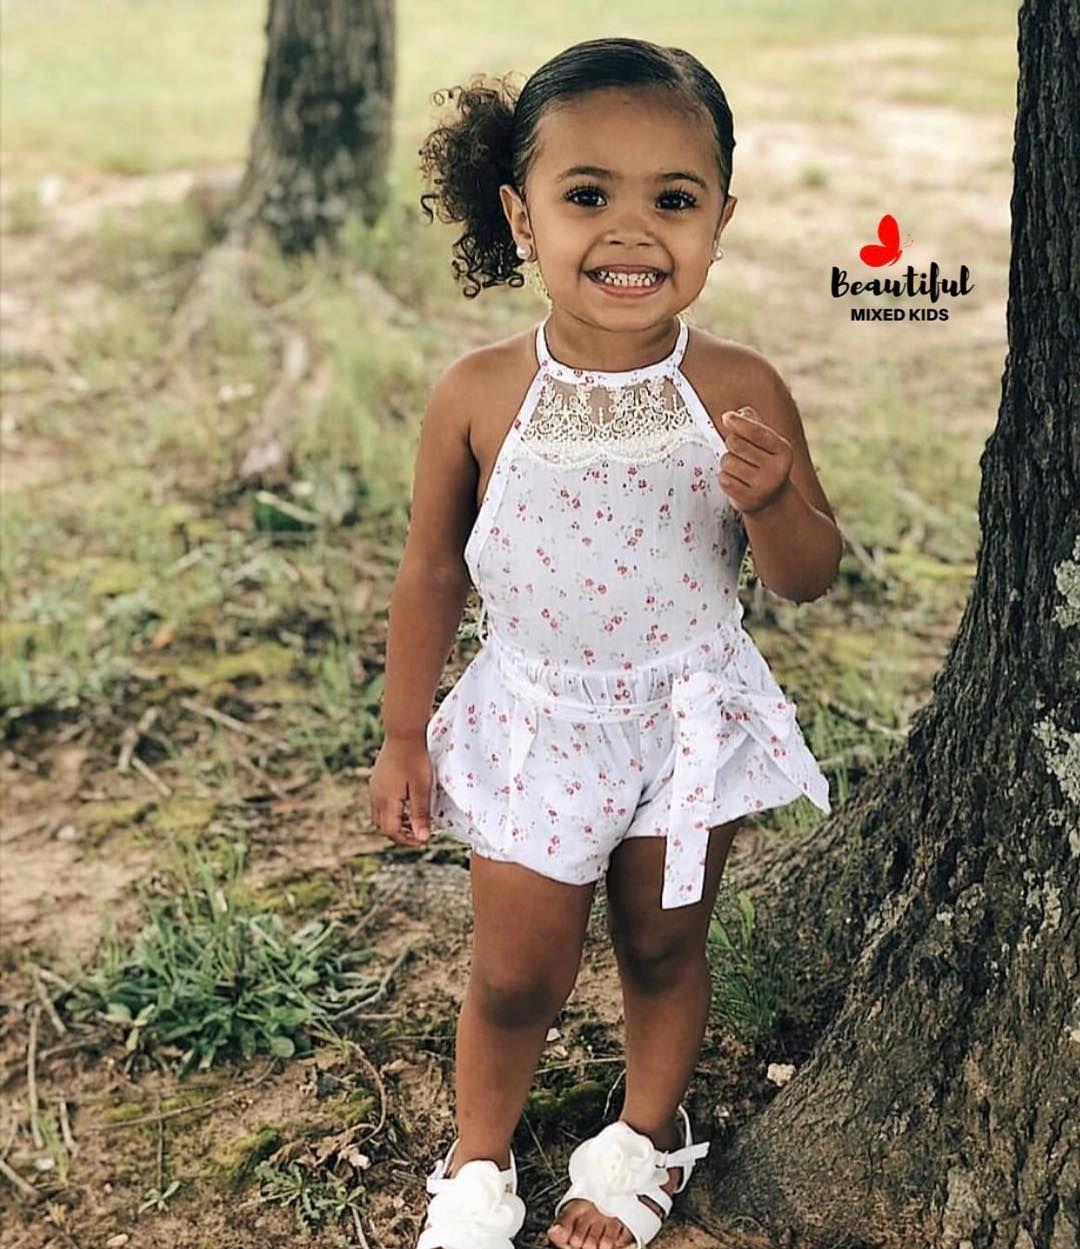 Fashion Black kids instagram pictures 2019